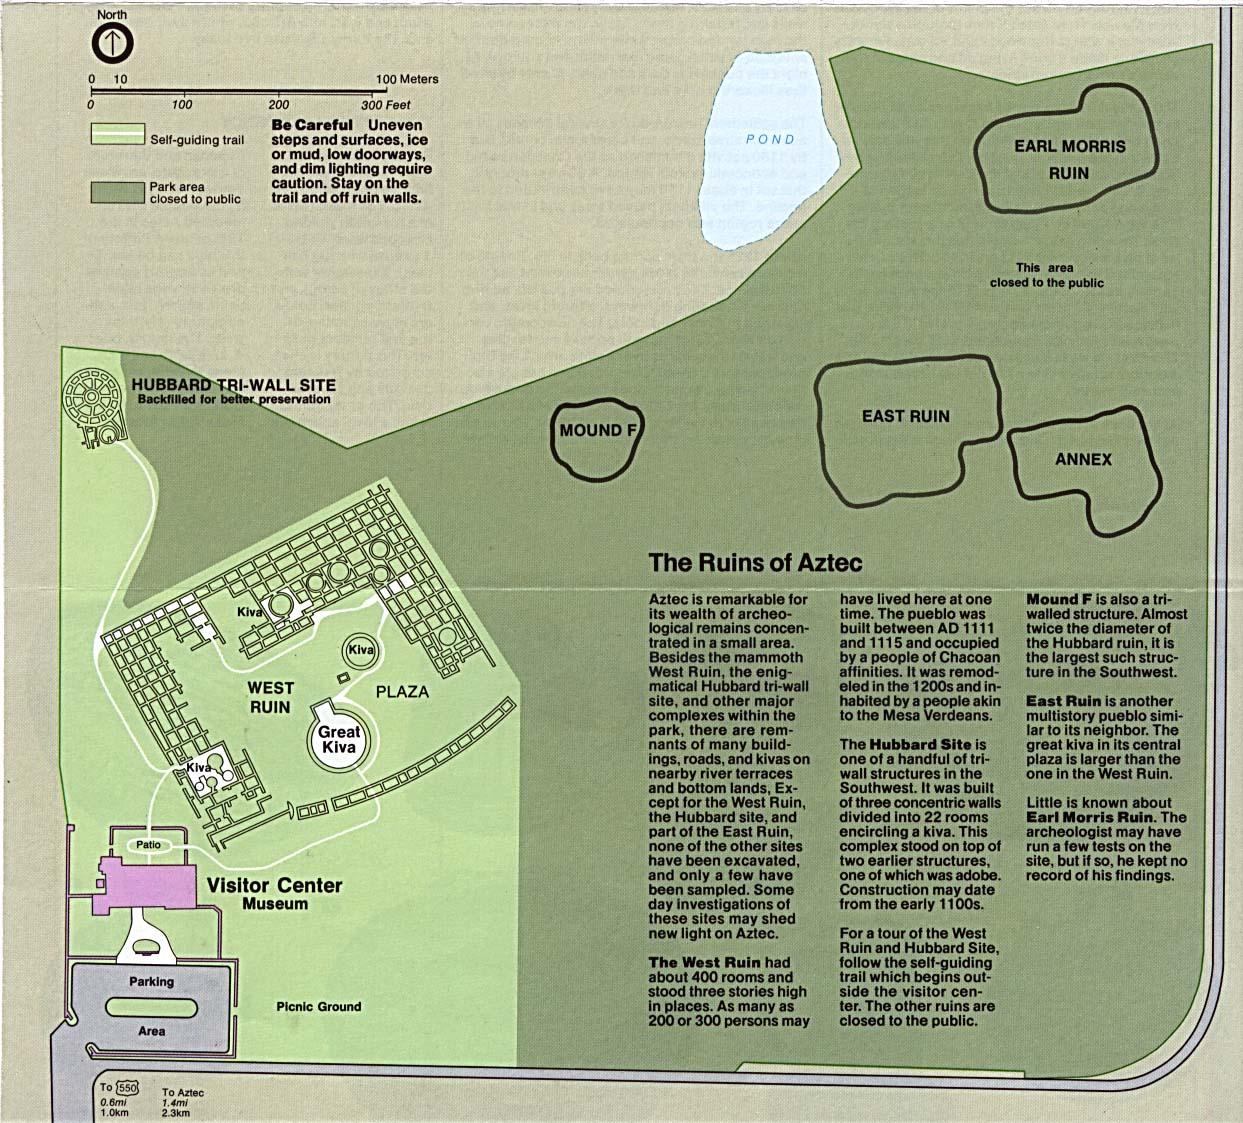 Ruins Location Location of Aztec Ruins